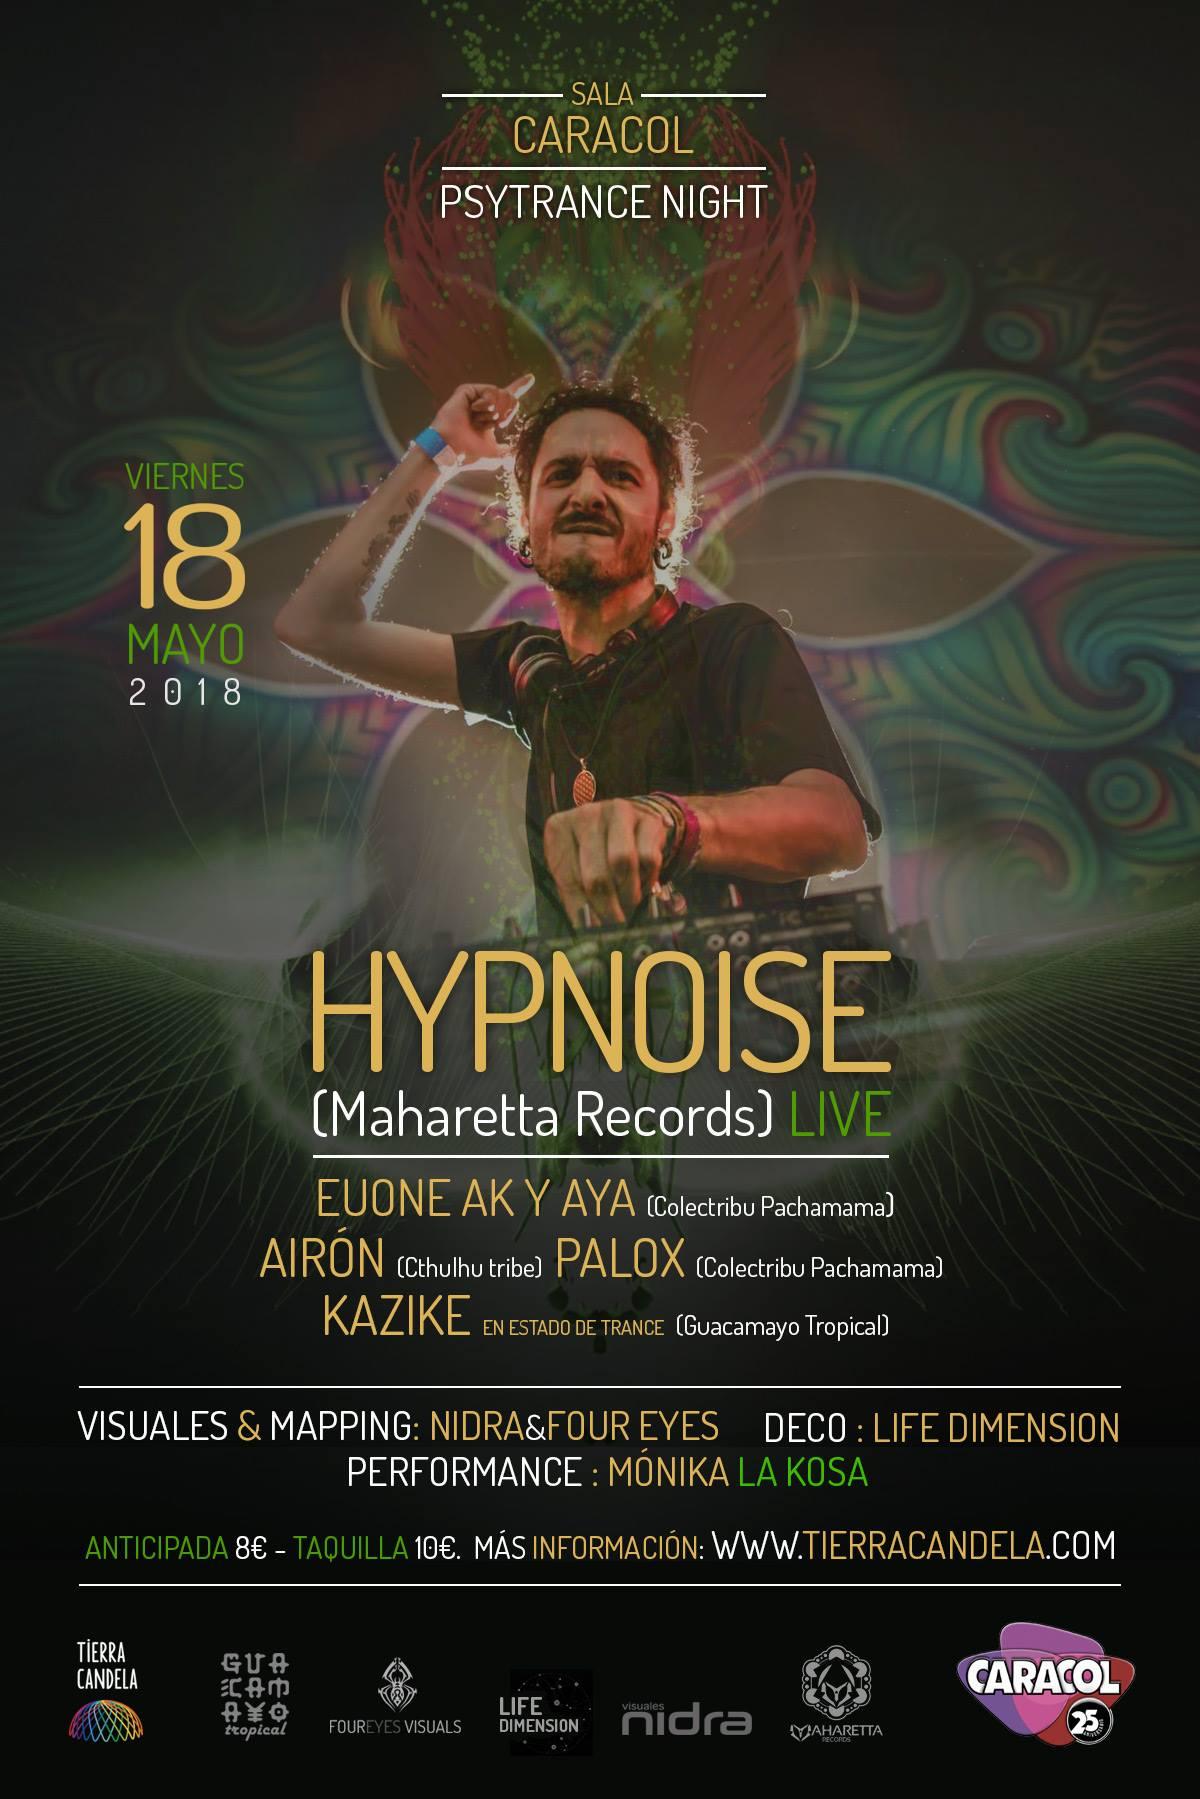 hypnoise sala caracol 18 de mayo madrid